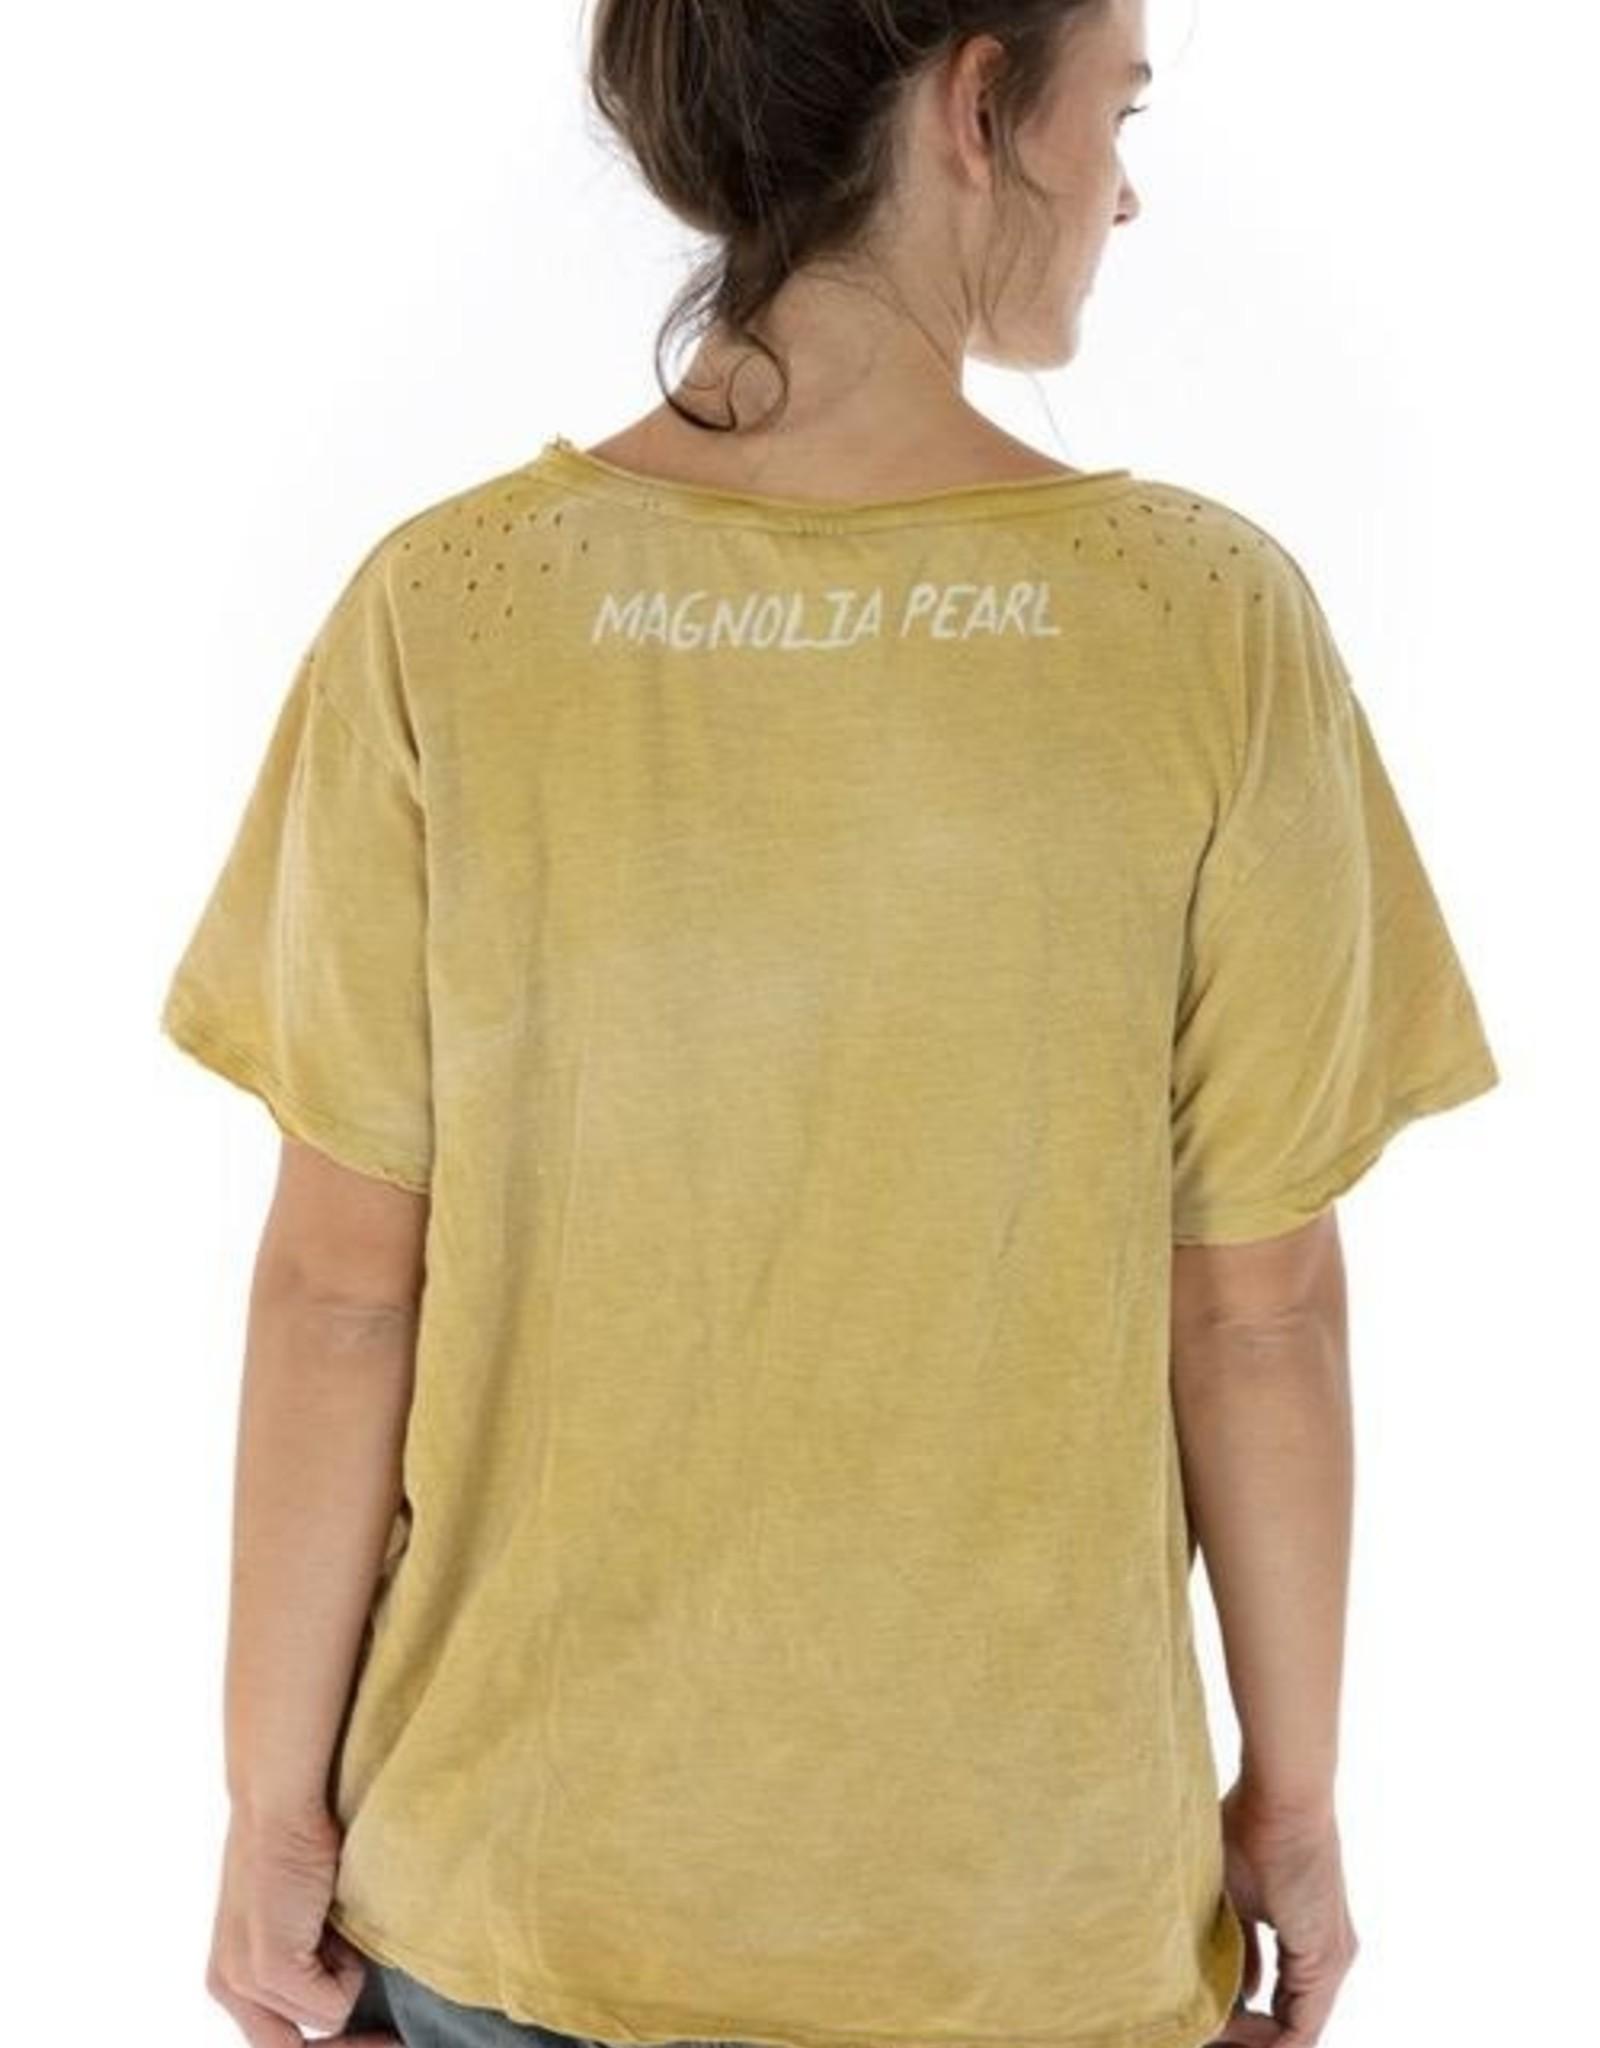 MAGNOLIA PEARL Star Child T Shirt